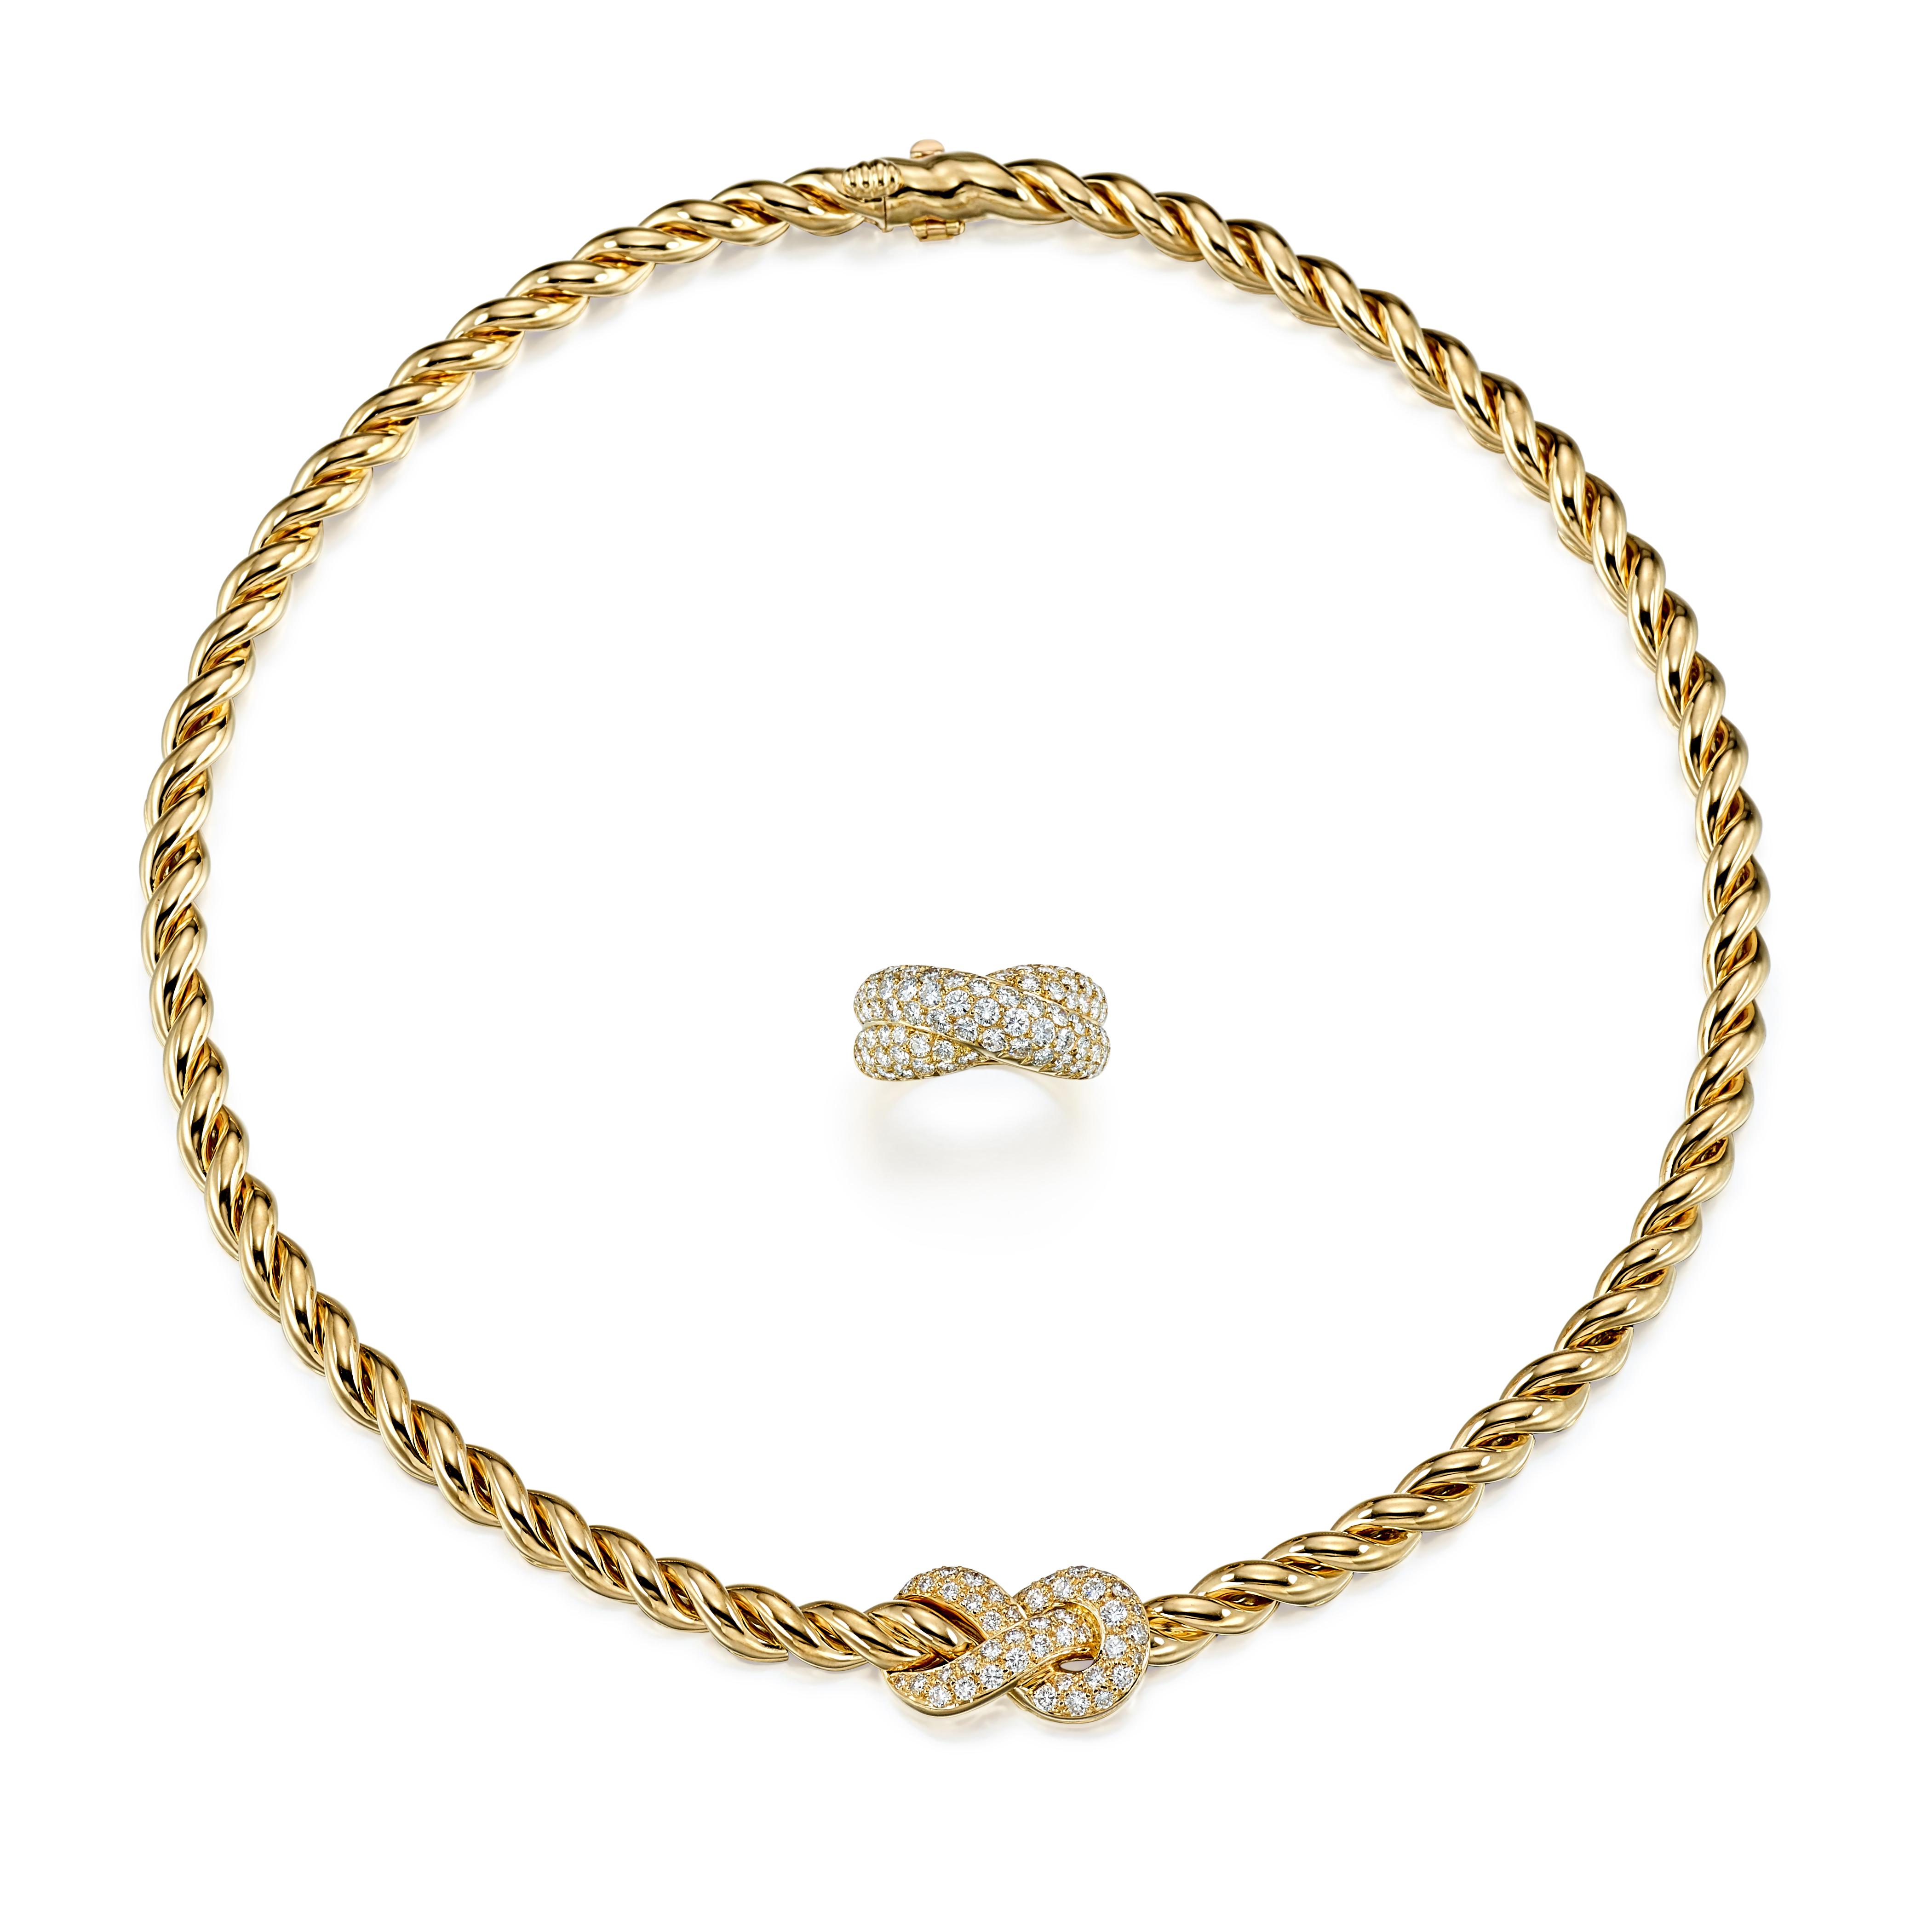 View 1 of Lot 9175.  GOLD AND DIAMOND DEMI PARURE, VAN CLEEF & ARPELS | K金 配 鑽石 項鏈及戒指套裝, 梵克雅寶(Van Cleef & Arpels).